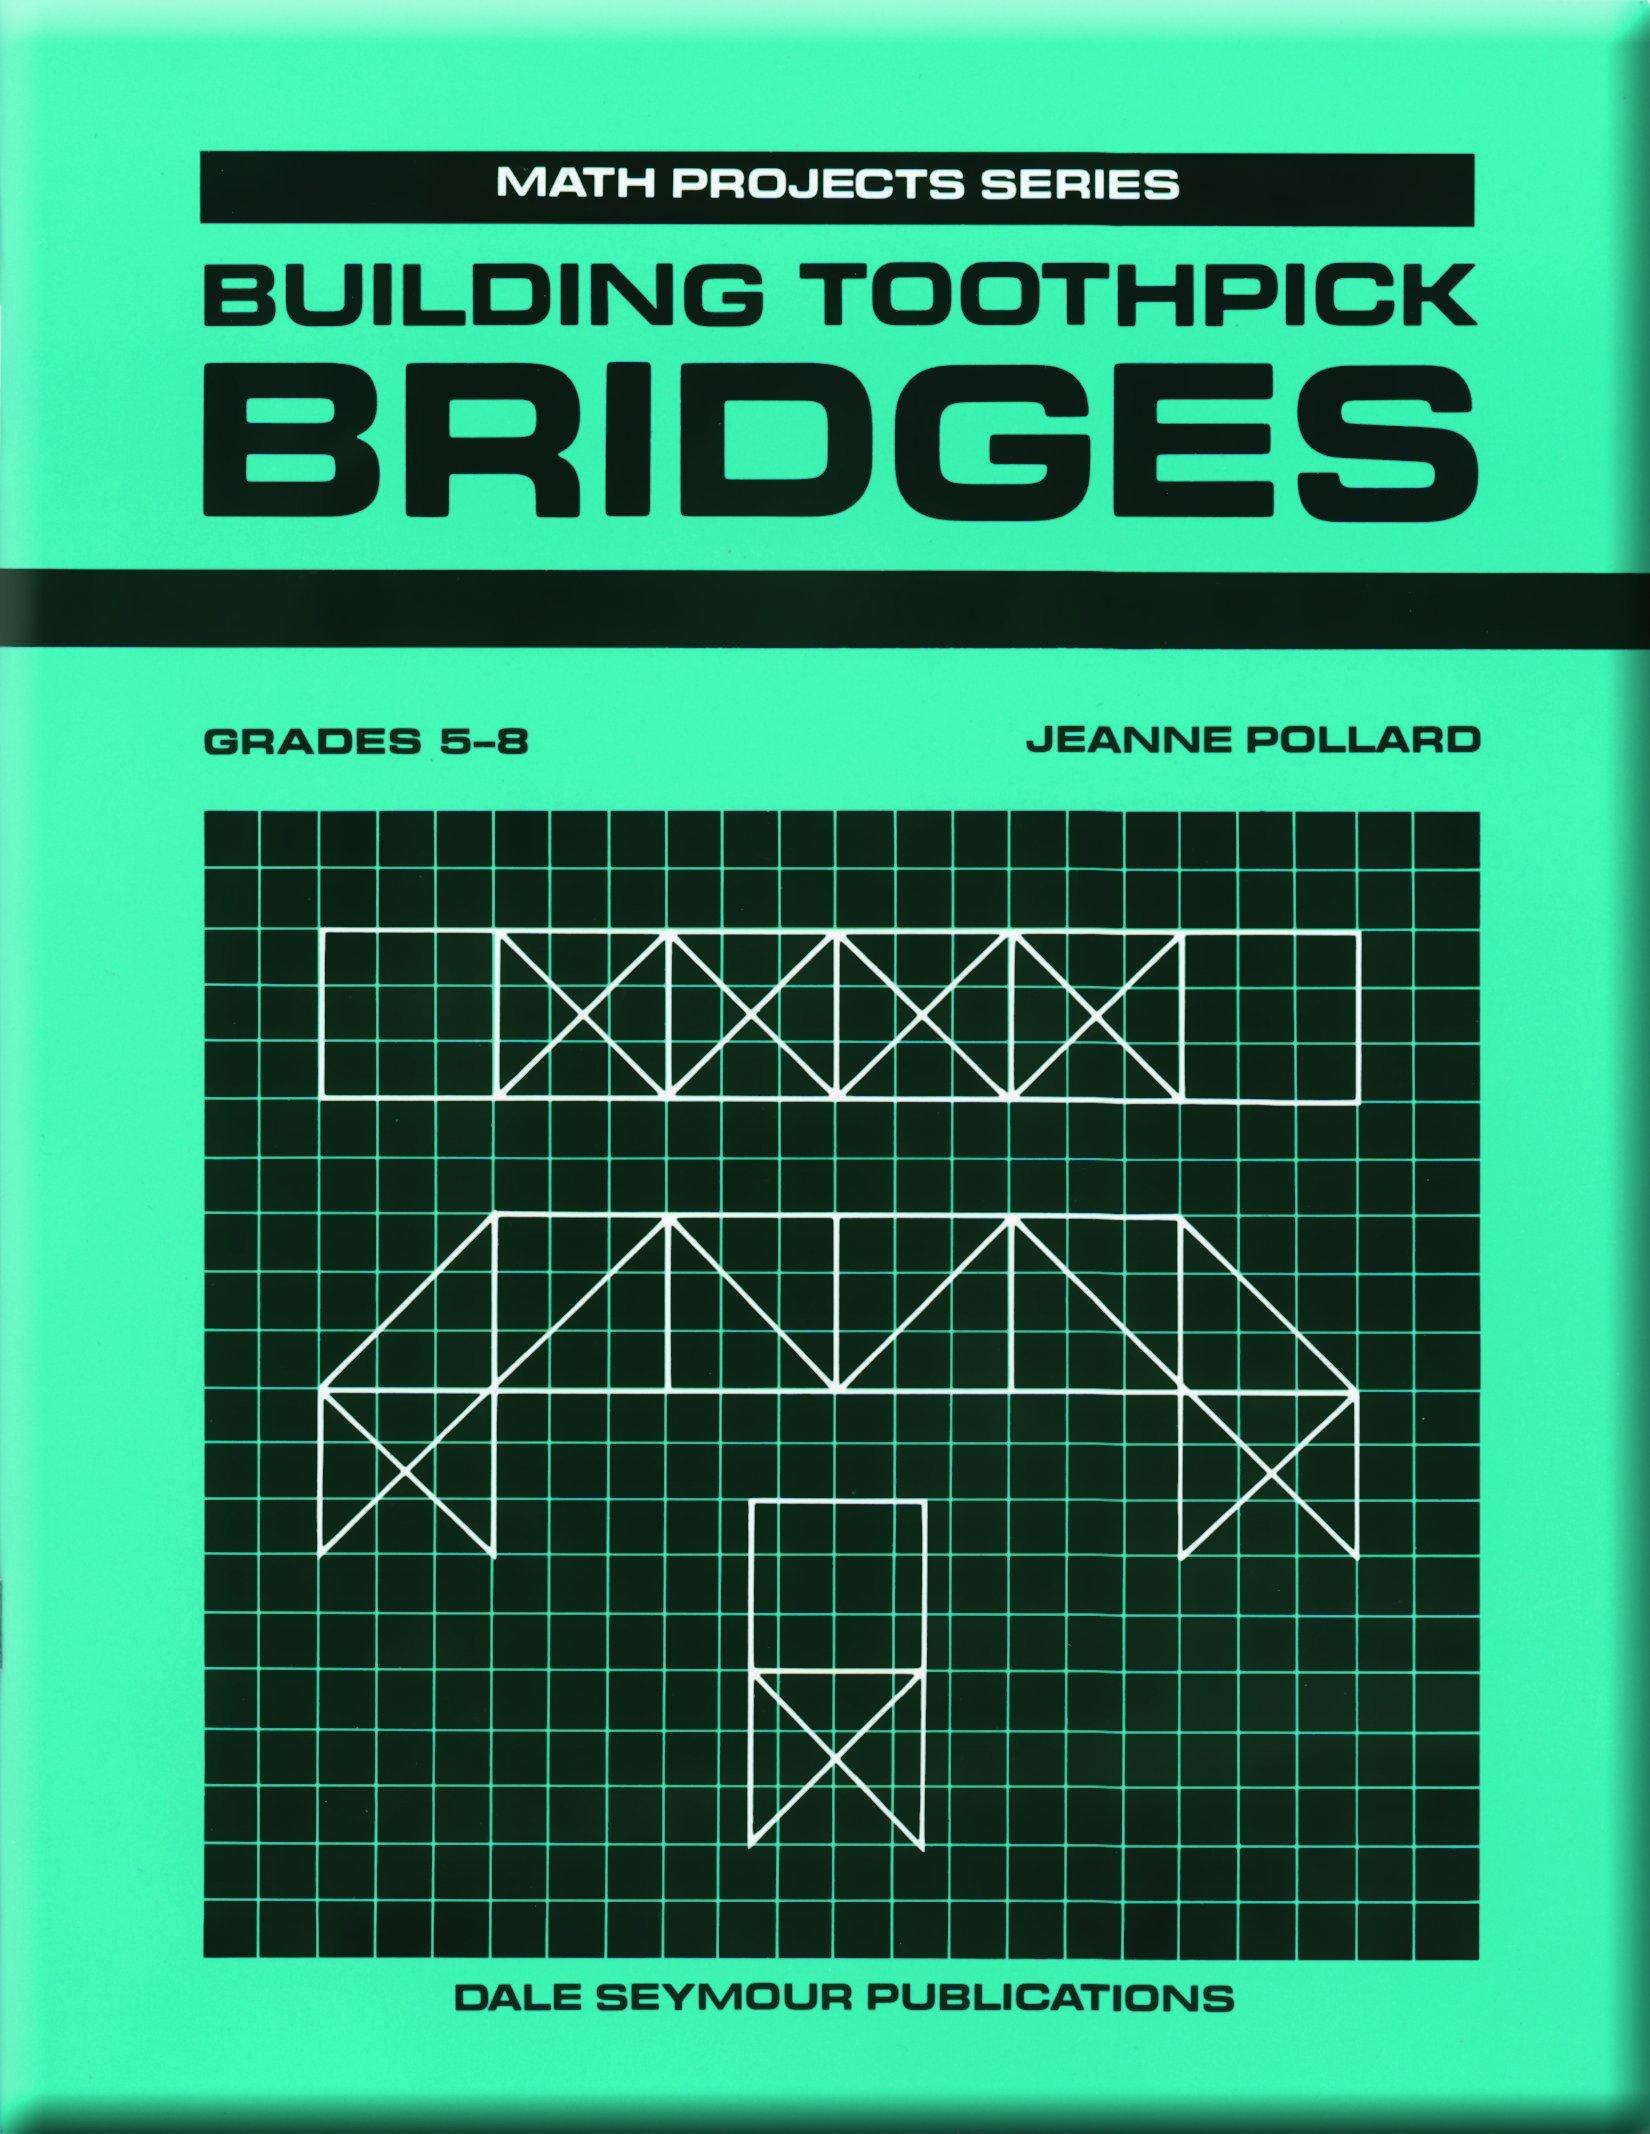 Building Toothpick Bridges Math Projects Grades 5 8 Dale Seymour Publications Secondary 9780866512664 Amazon Com Books